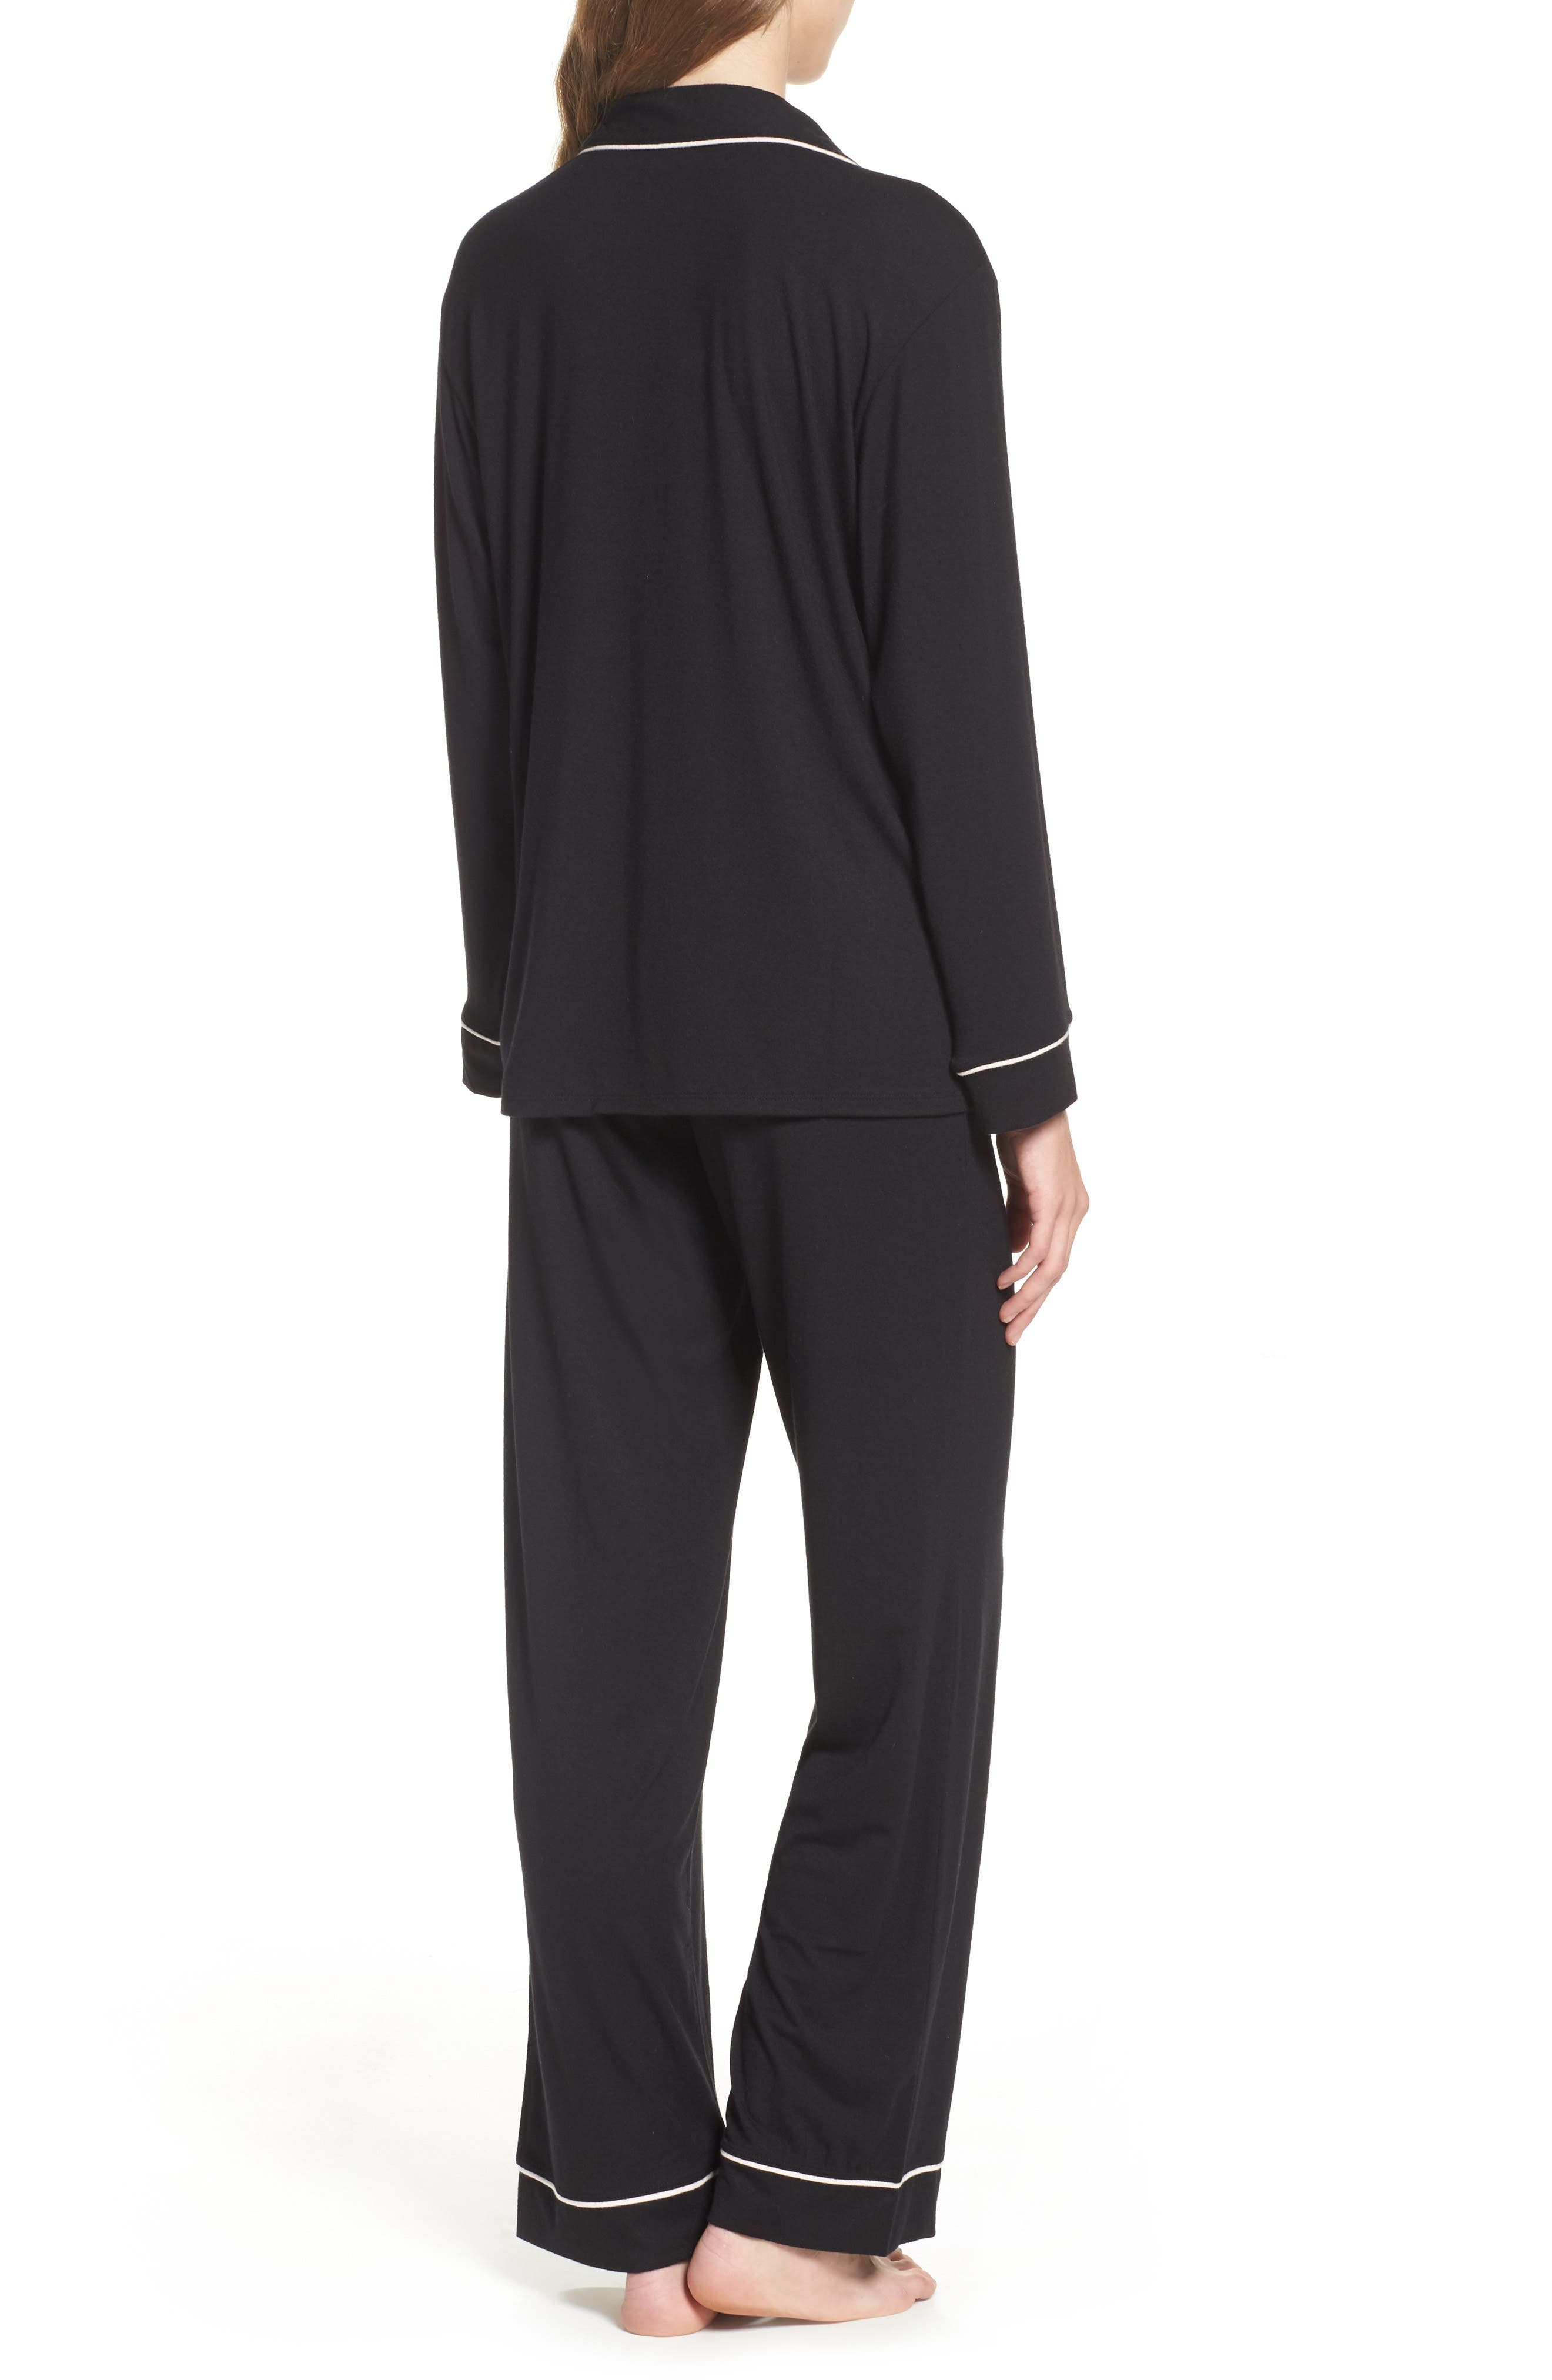 'Giselle' Pajamas,                             Alternate thumbnail 3, color,                             BLACK/ SORBET PINK